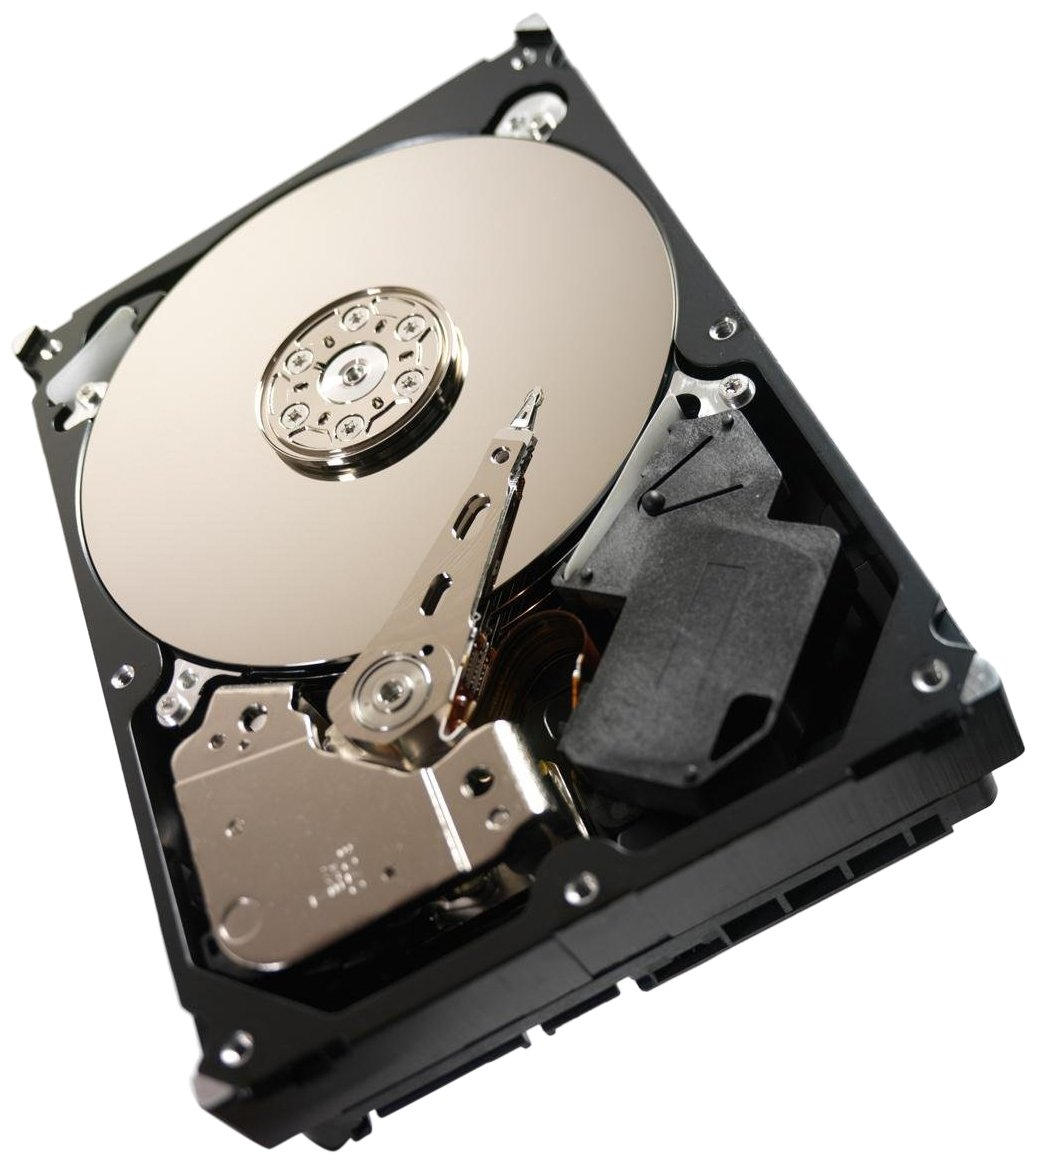 Seagate SV35 1TB 7200RPM SATA 6-Gb/s 64MB Cache 3.5-Inch Internal Drive for Video Surveillance ST1000VX000